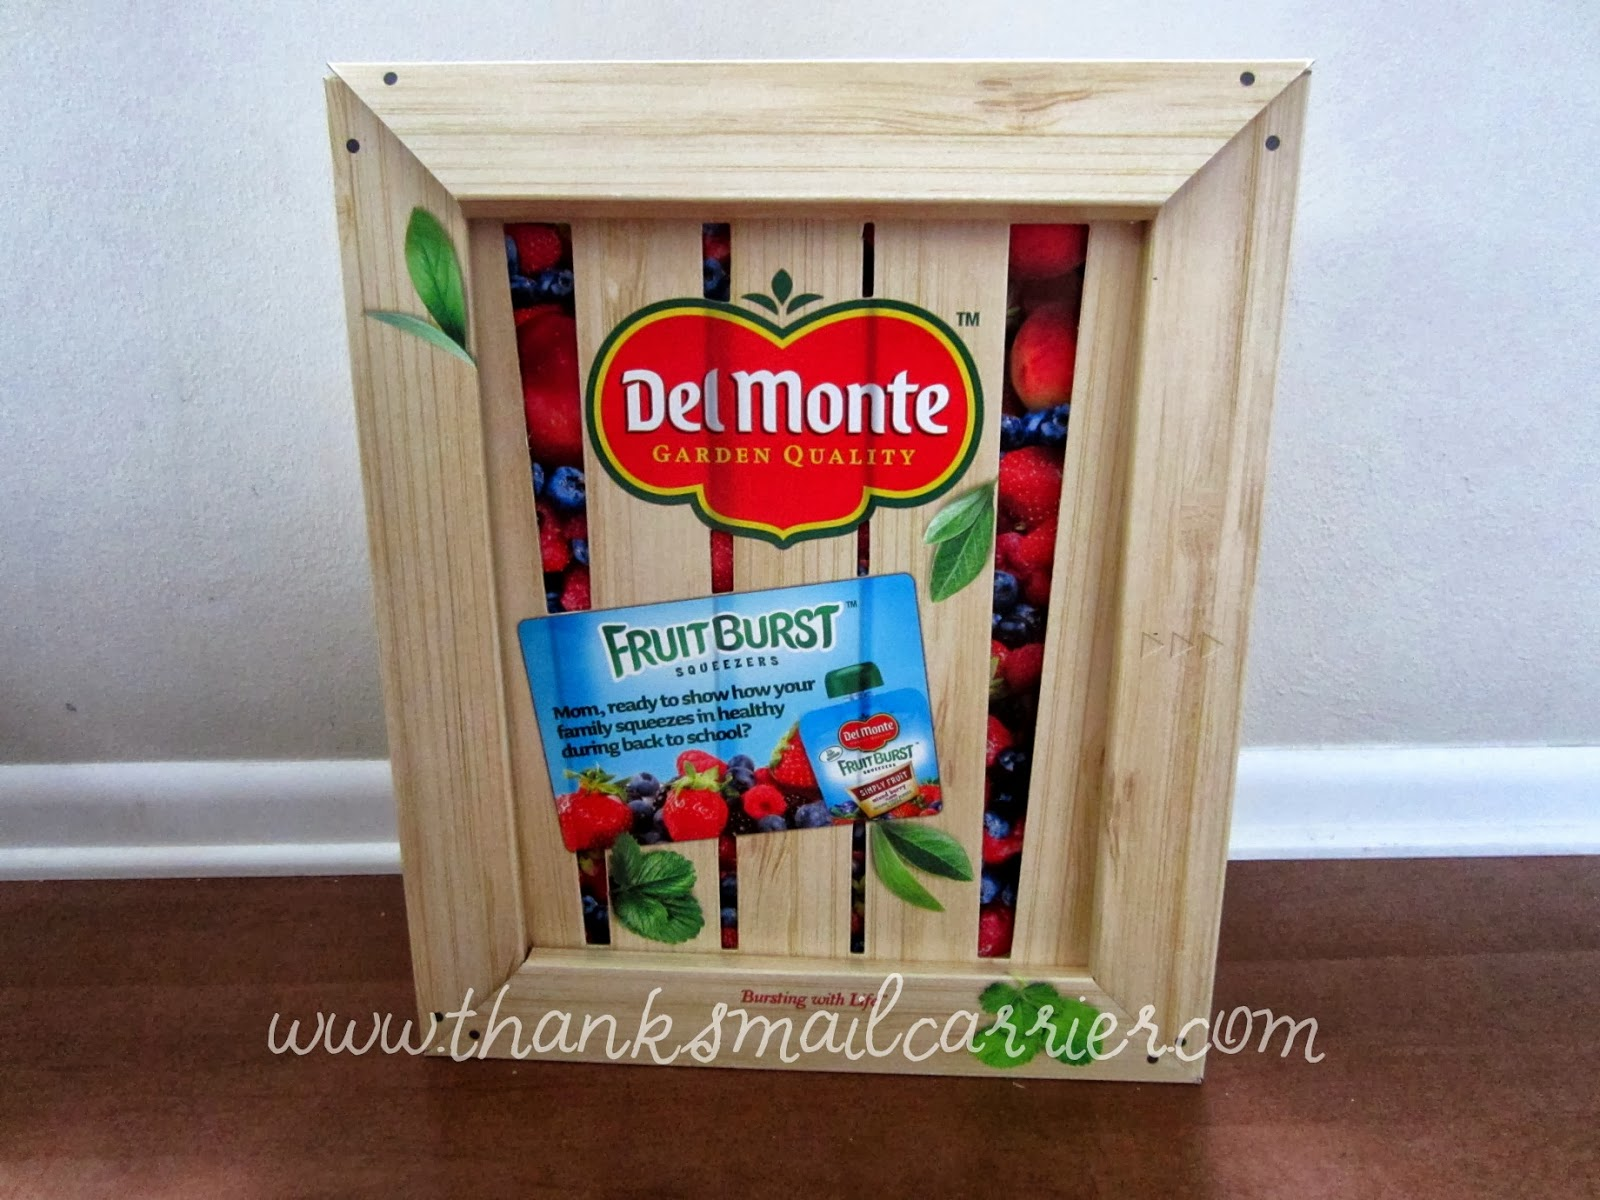 Del Monte review